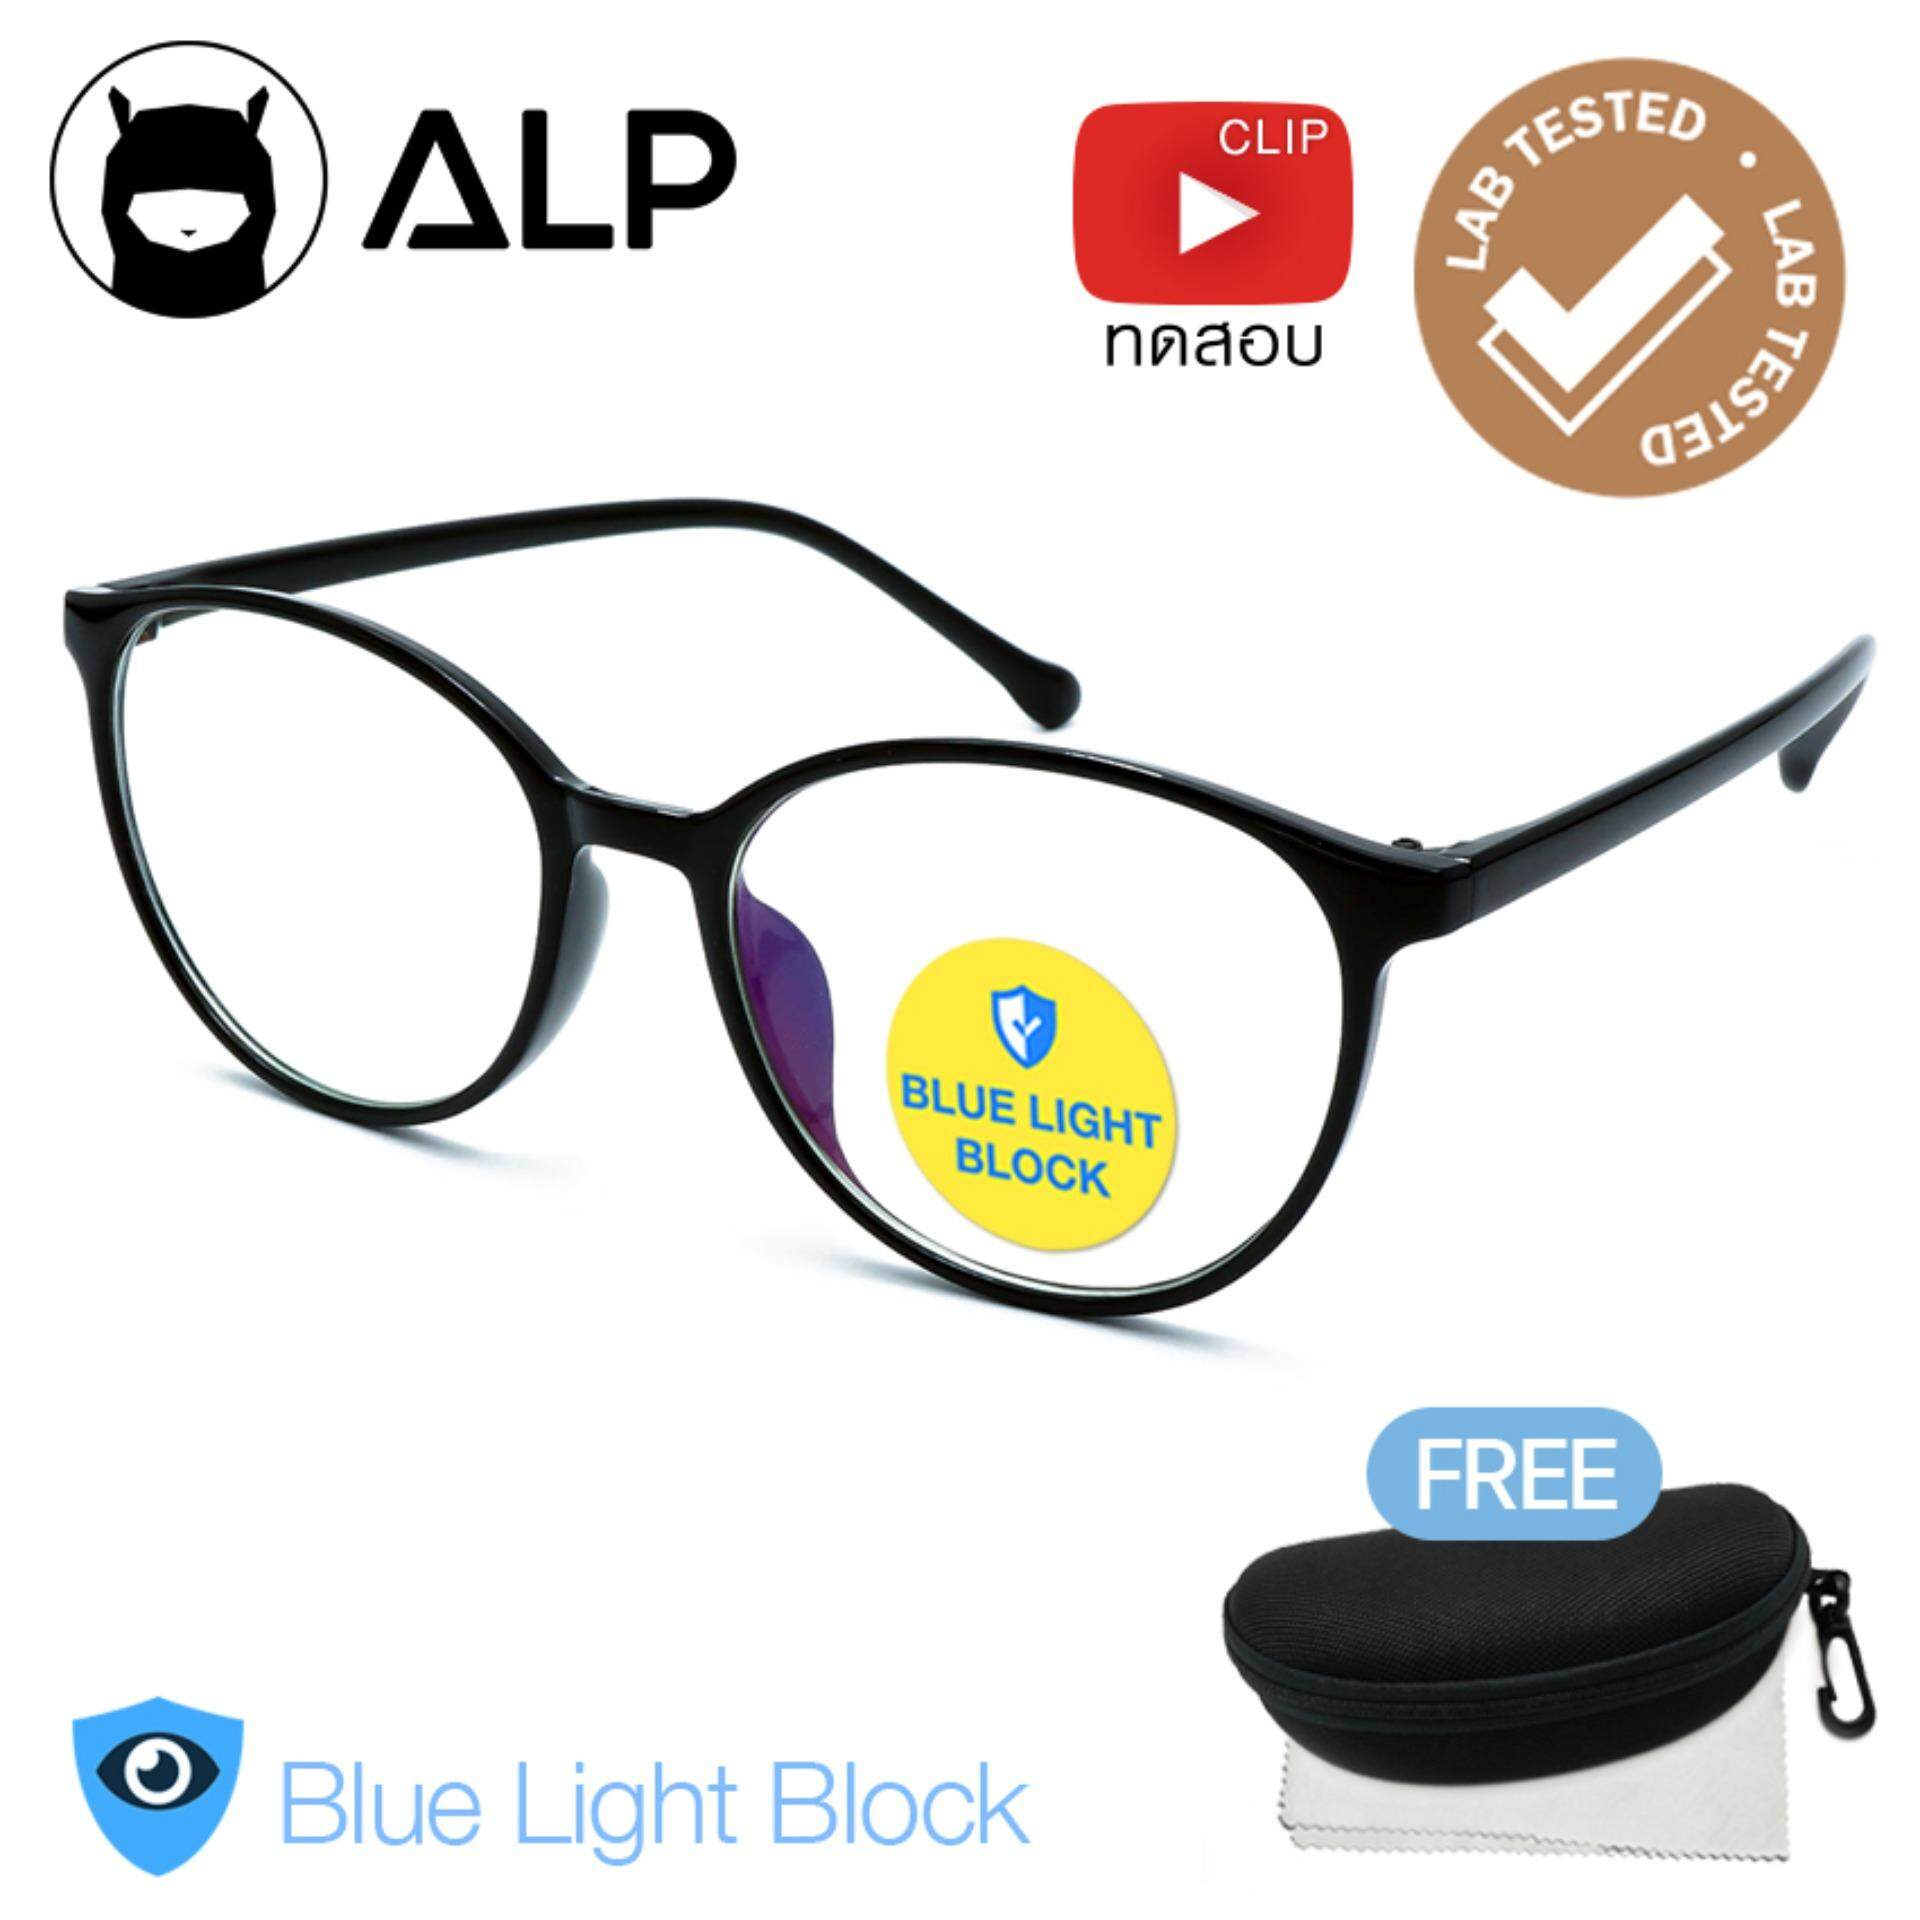 Alp Computer Glasses แว่นกรองแสง แว่นคอมพิวเตอร์ กรองแสงสีฟ้า Blue Light Block  กันรังสี Uv, Uva, Uvb กรอบแว่นตา Vintage Oval Style รุ่น Alp-E035.